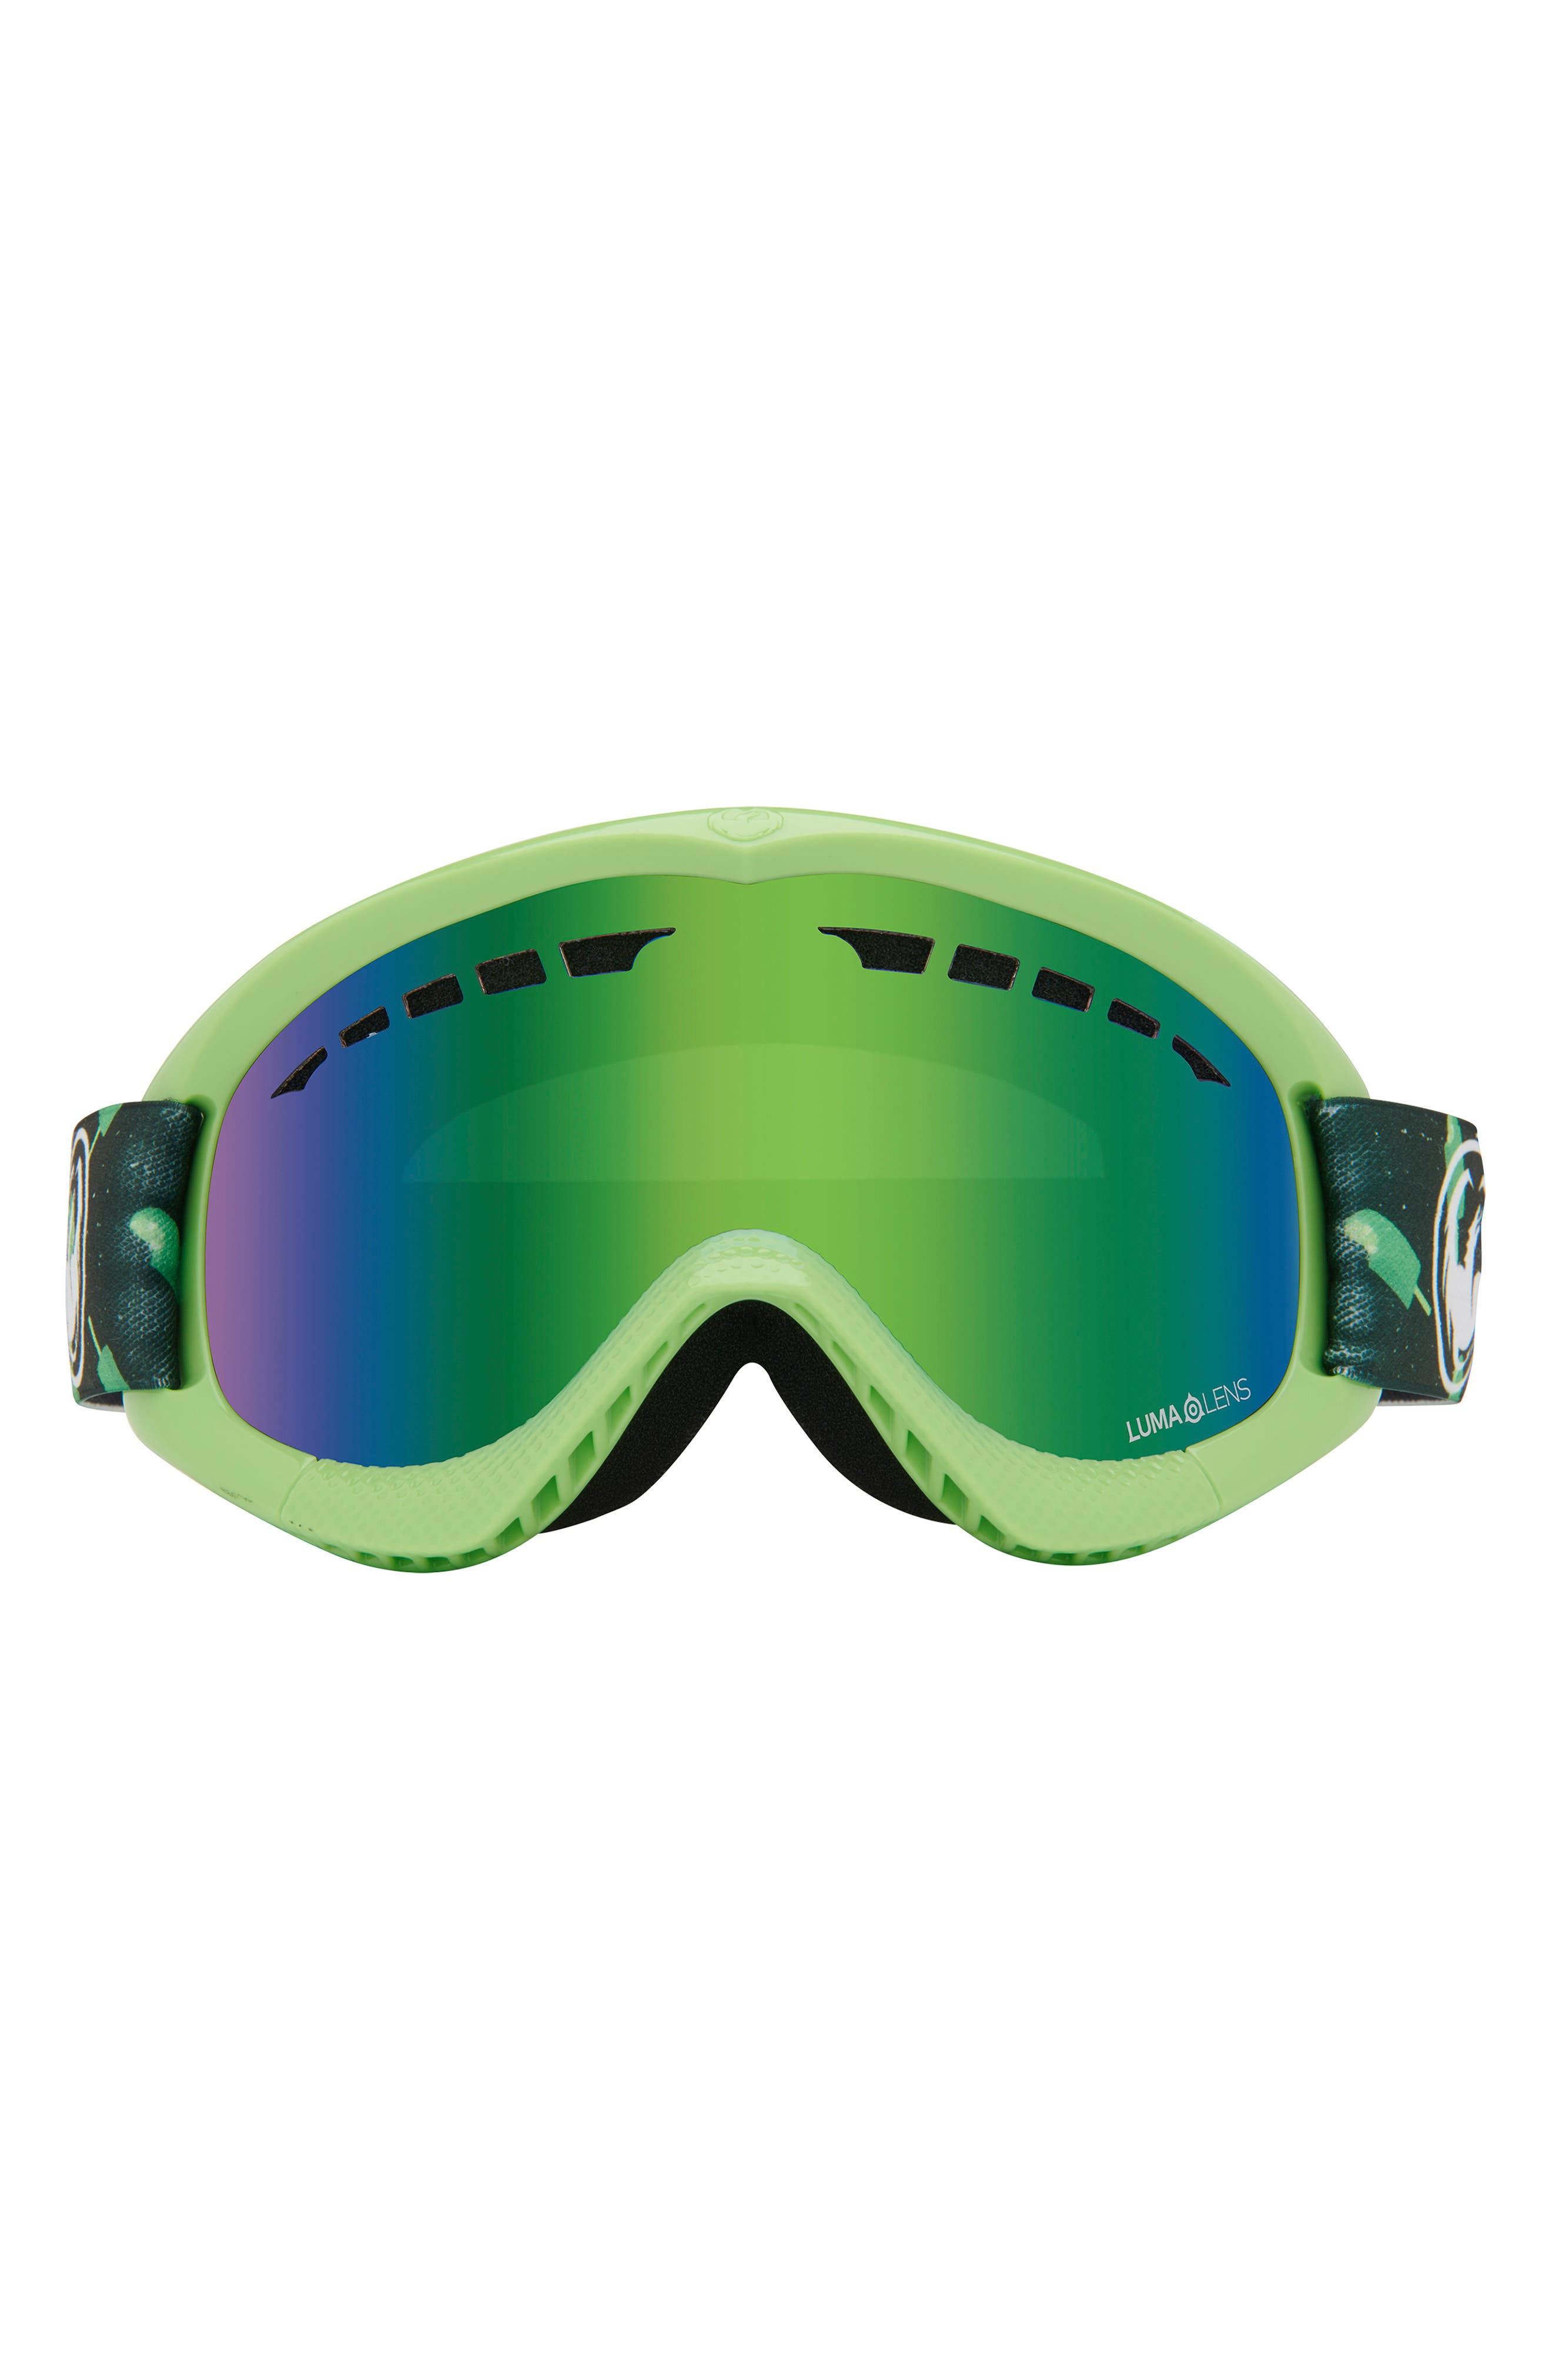 Dxs Base Ion 60mm Snow Goggles